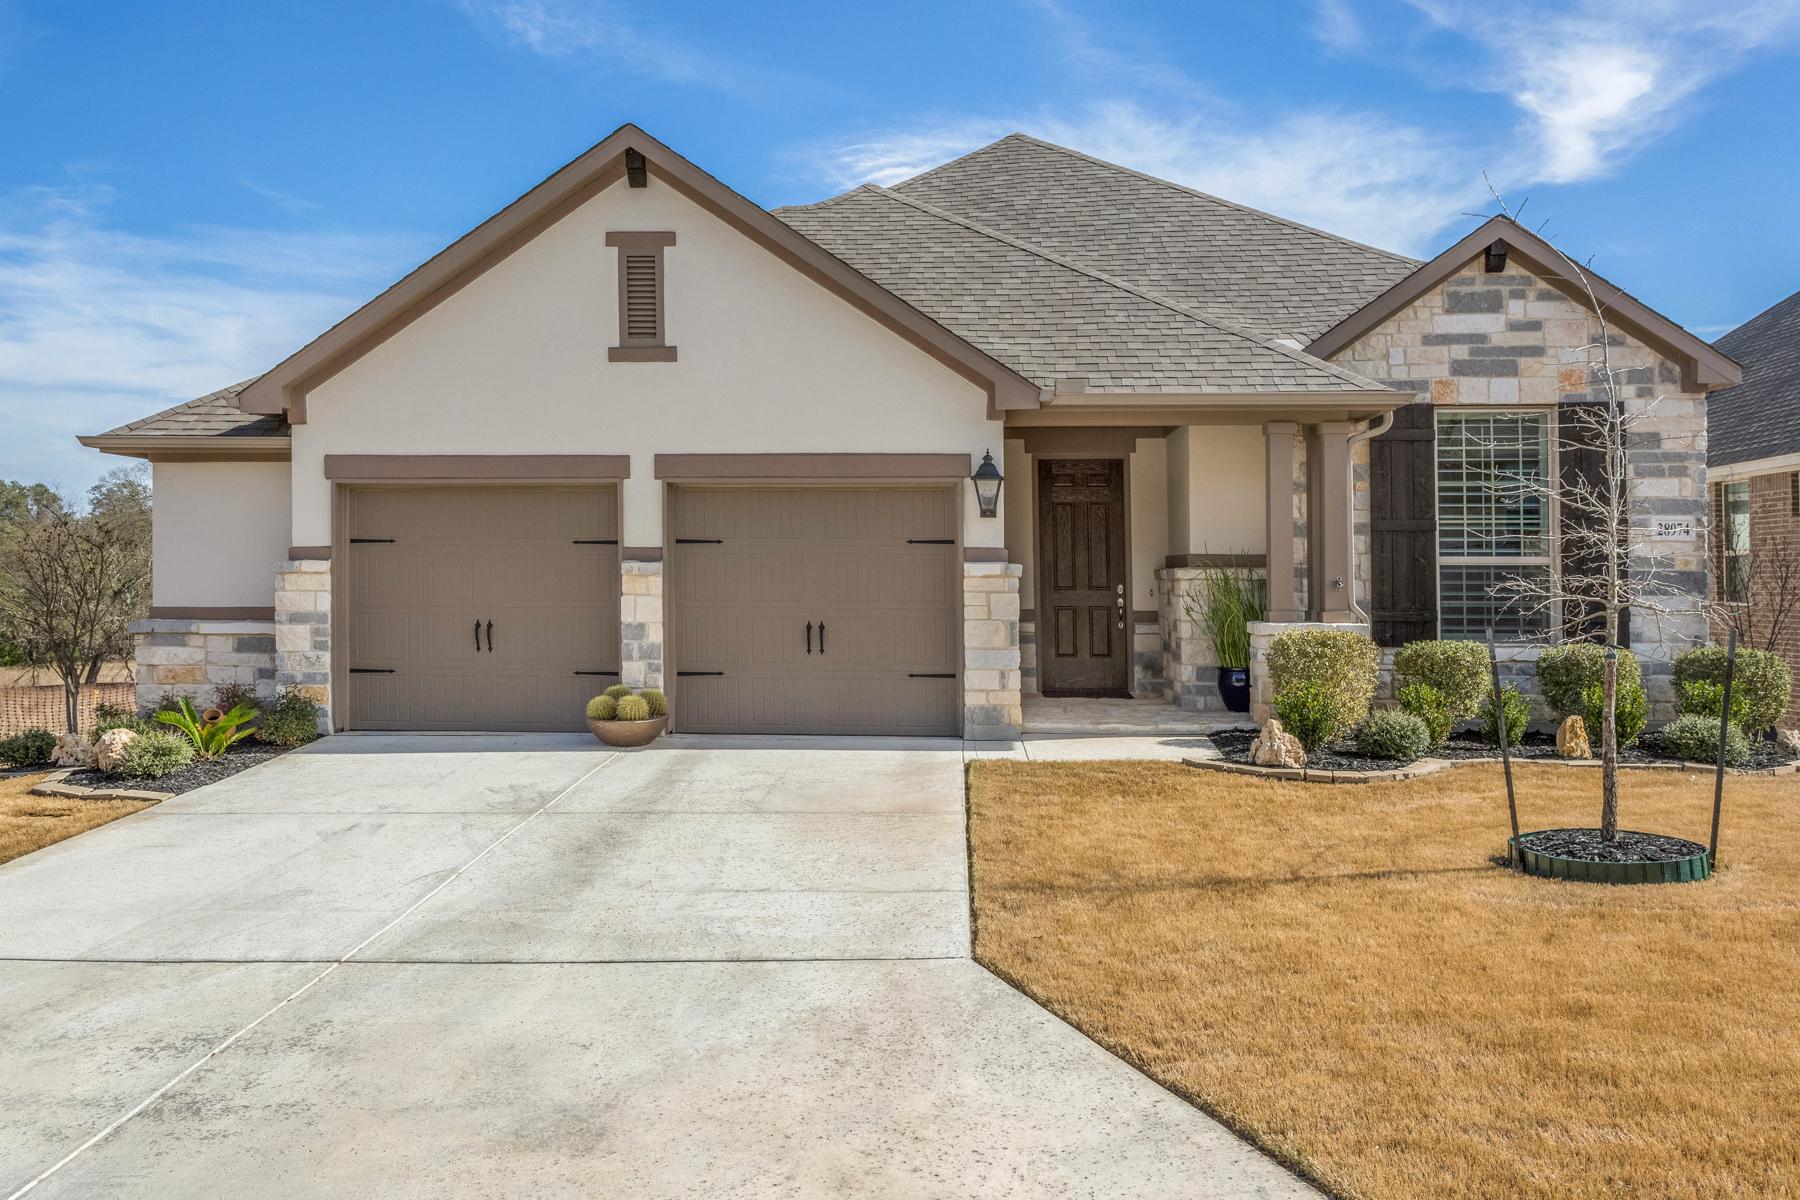 Casa Unifamiliar por un Venta en Great Home in Front Gate 28974 Fairs Gate Fair Oaks Ranch, Texas 78015 Estados Unidos